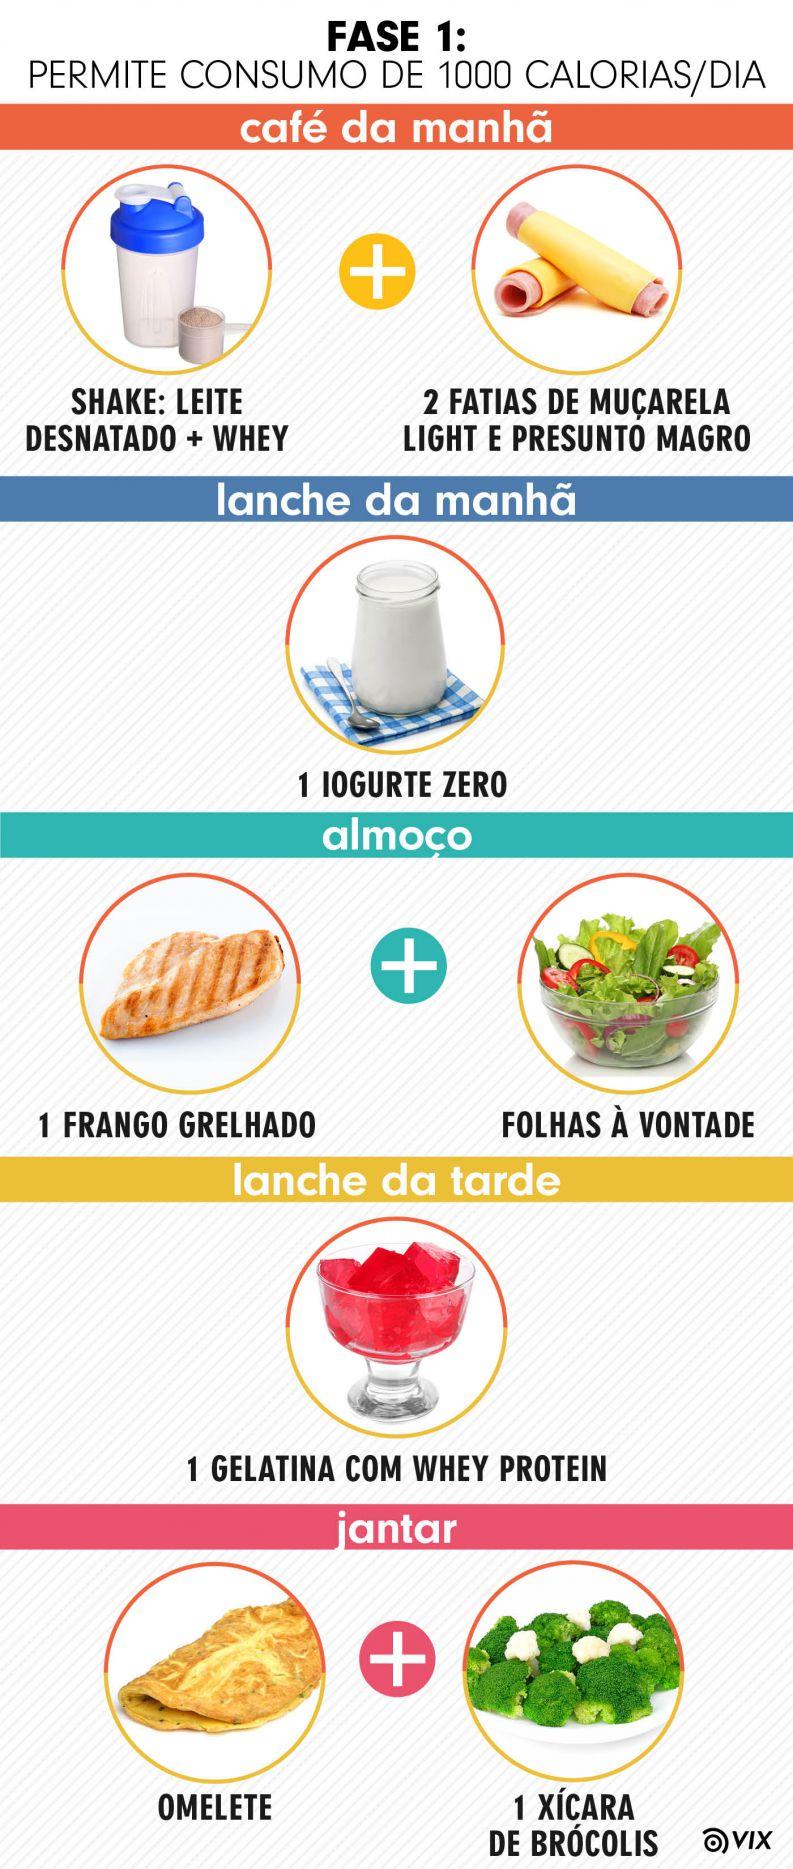 dietaproteina_info1